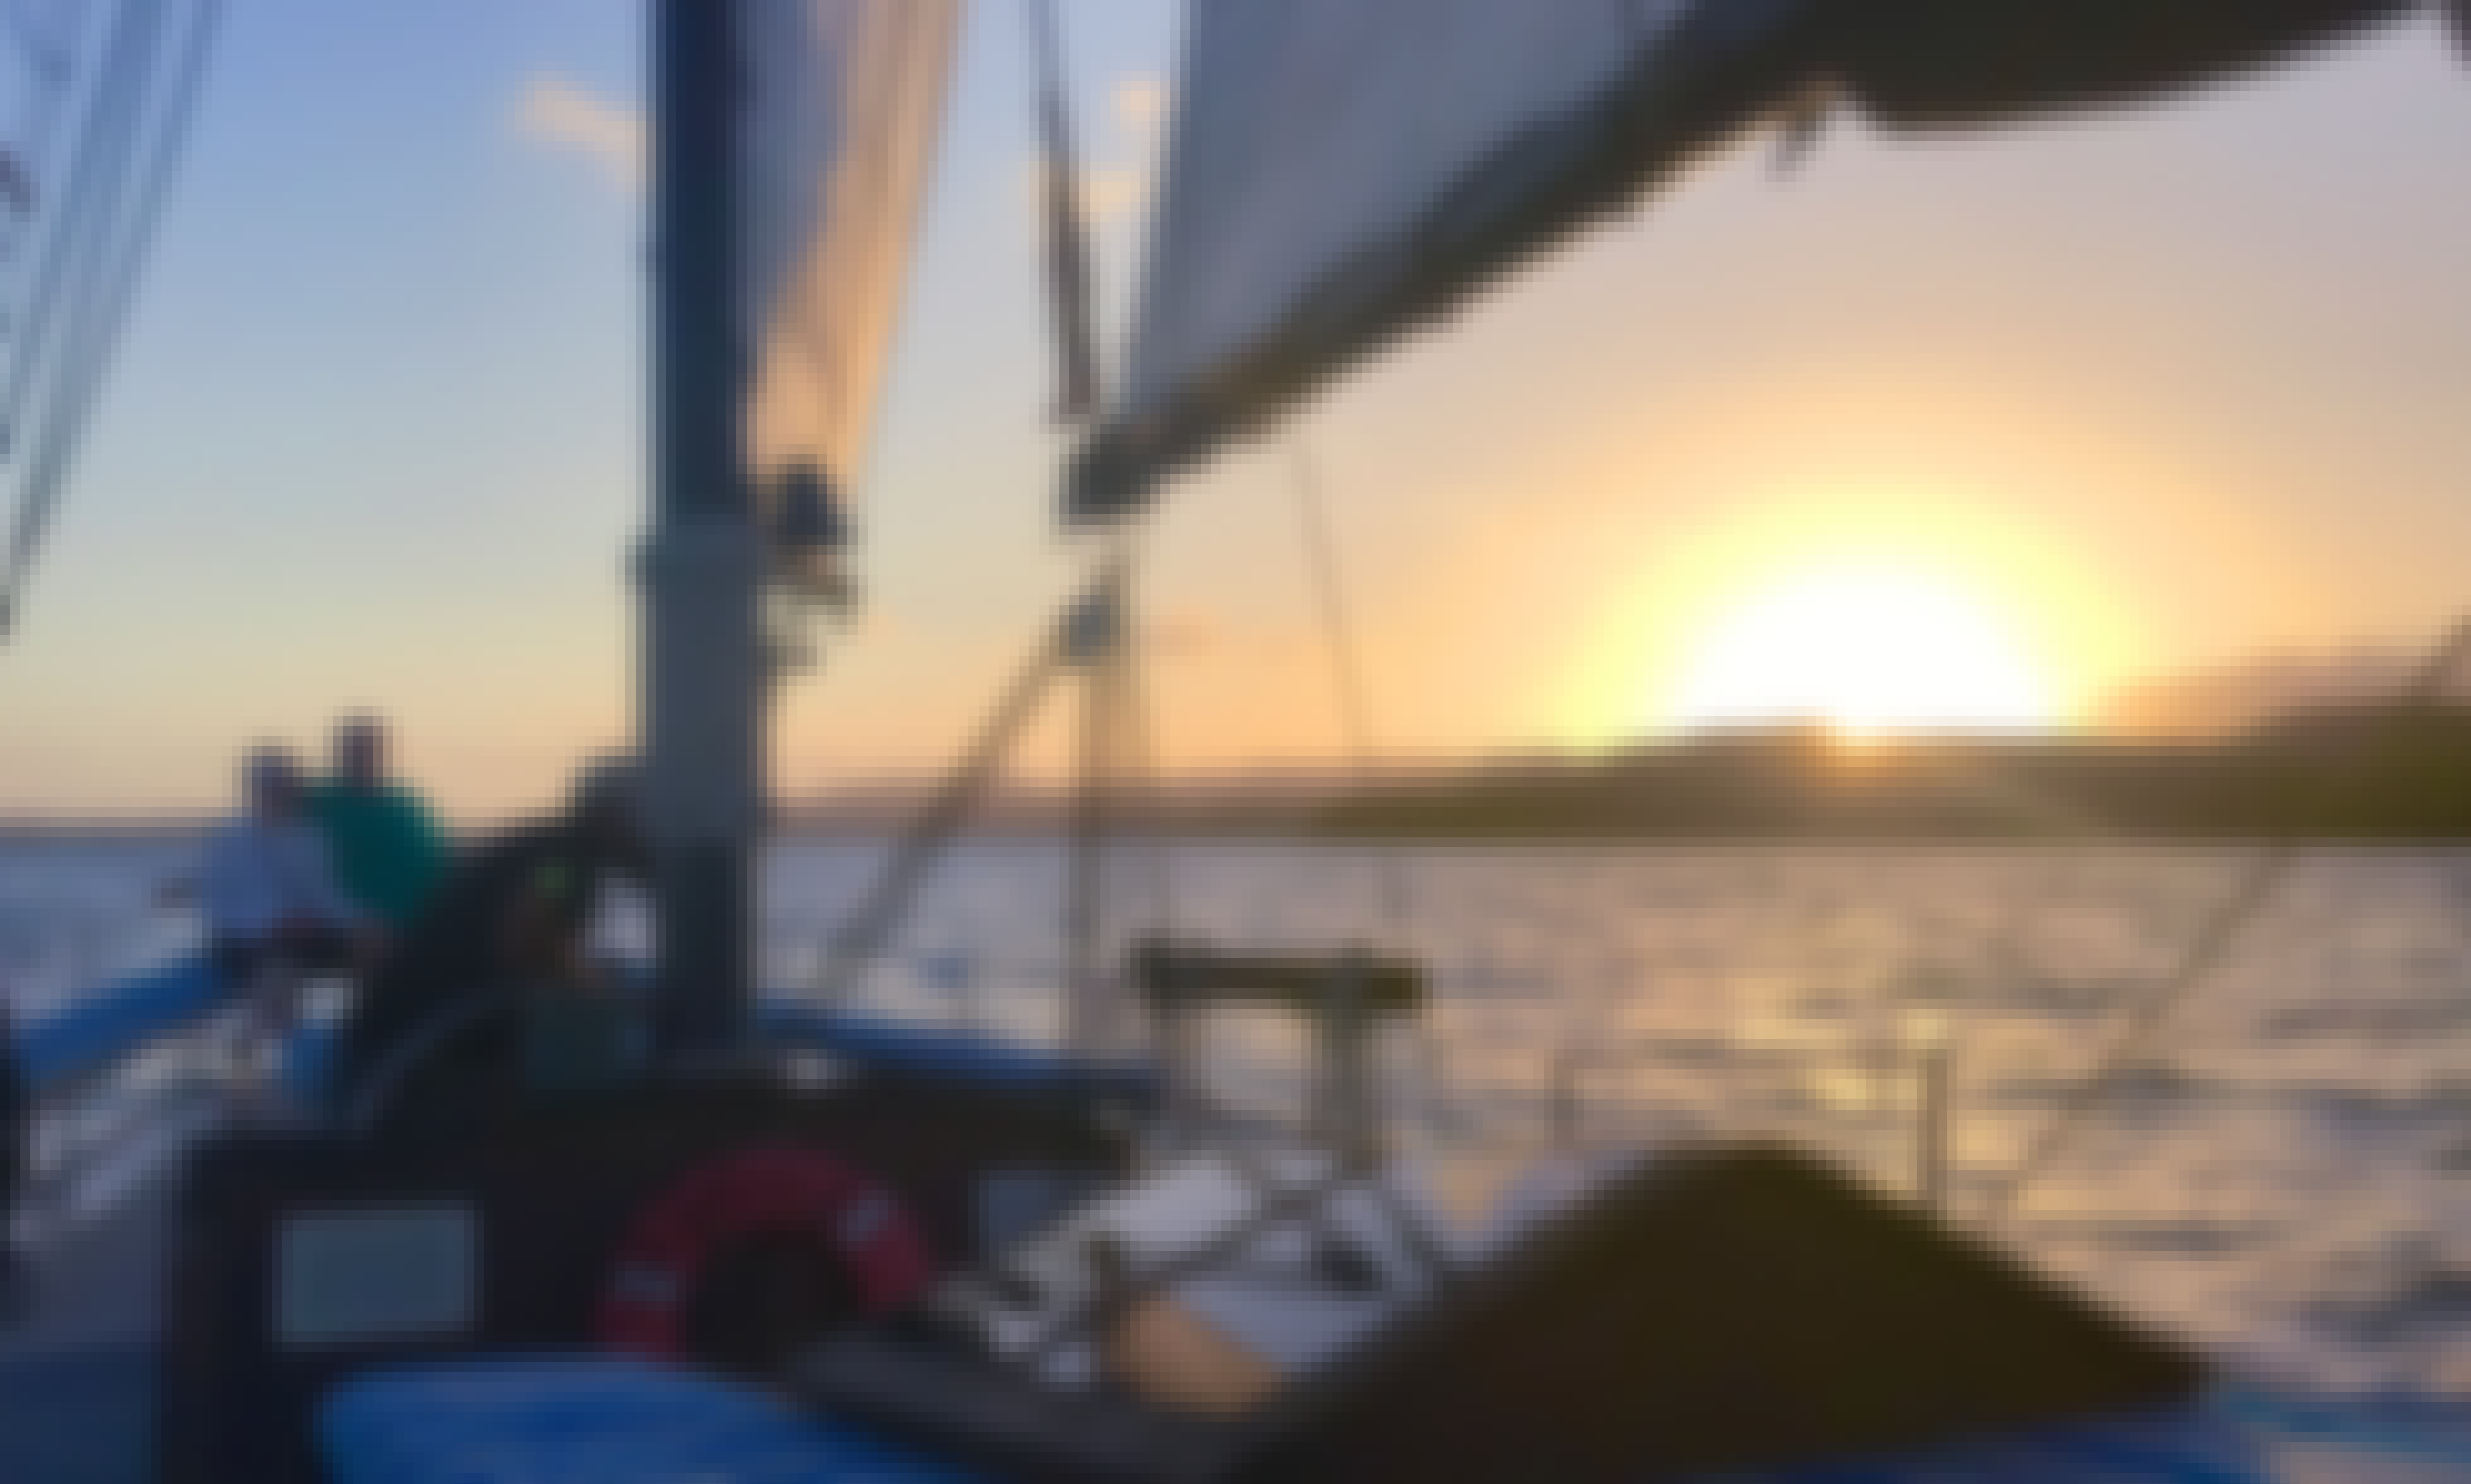 Schooner Rig 44 Sail Pirate Ship Sunset Charter - Fajardo, Puerto Rico